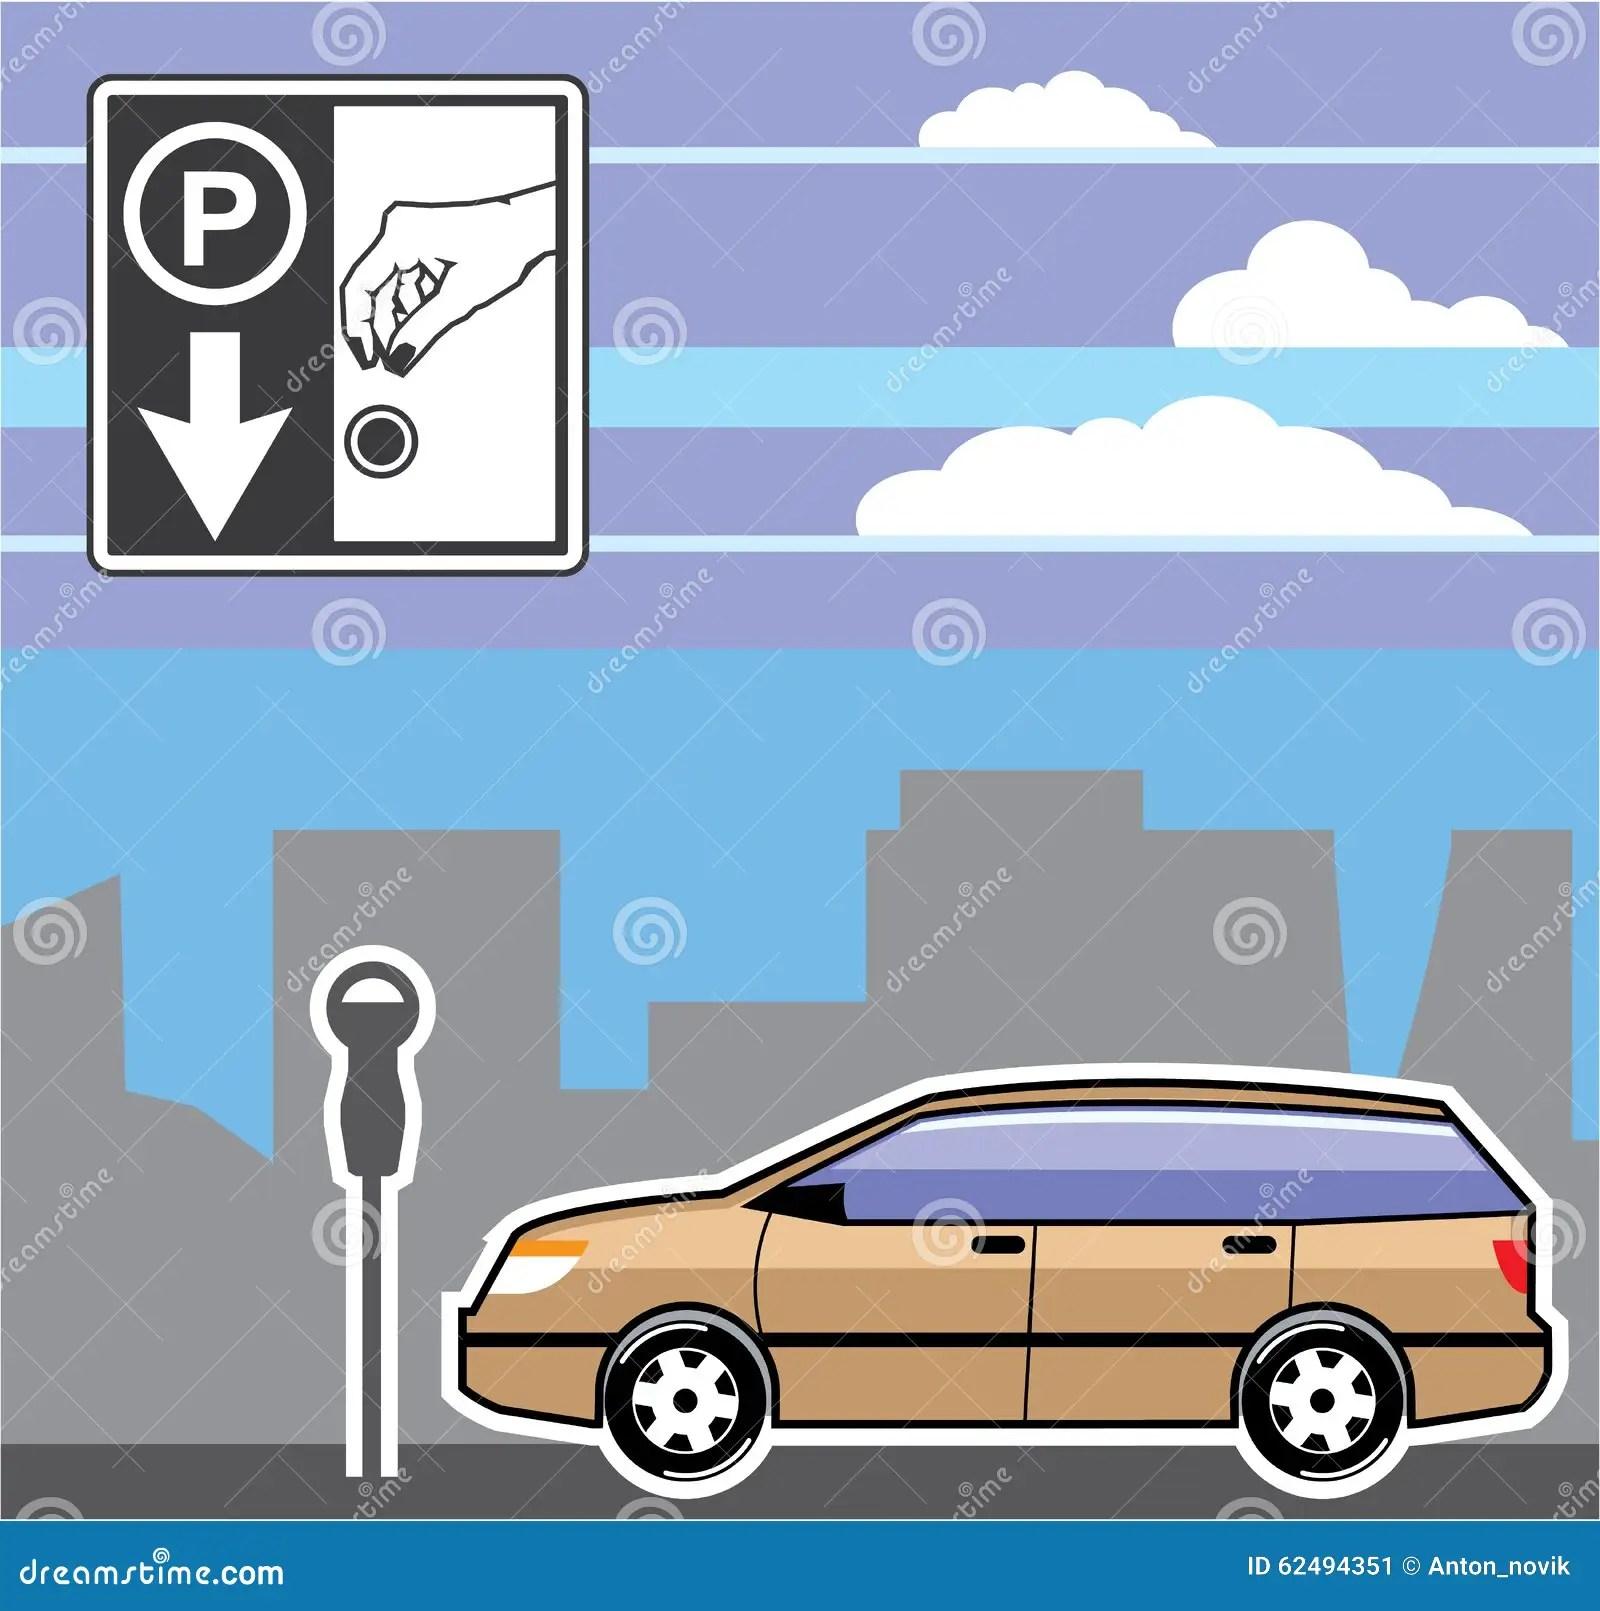 vehicle diagram clip art 2016 dodge dart sxt wiring paid parking meter car vector stock illustration